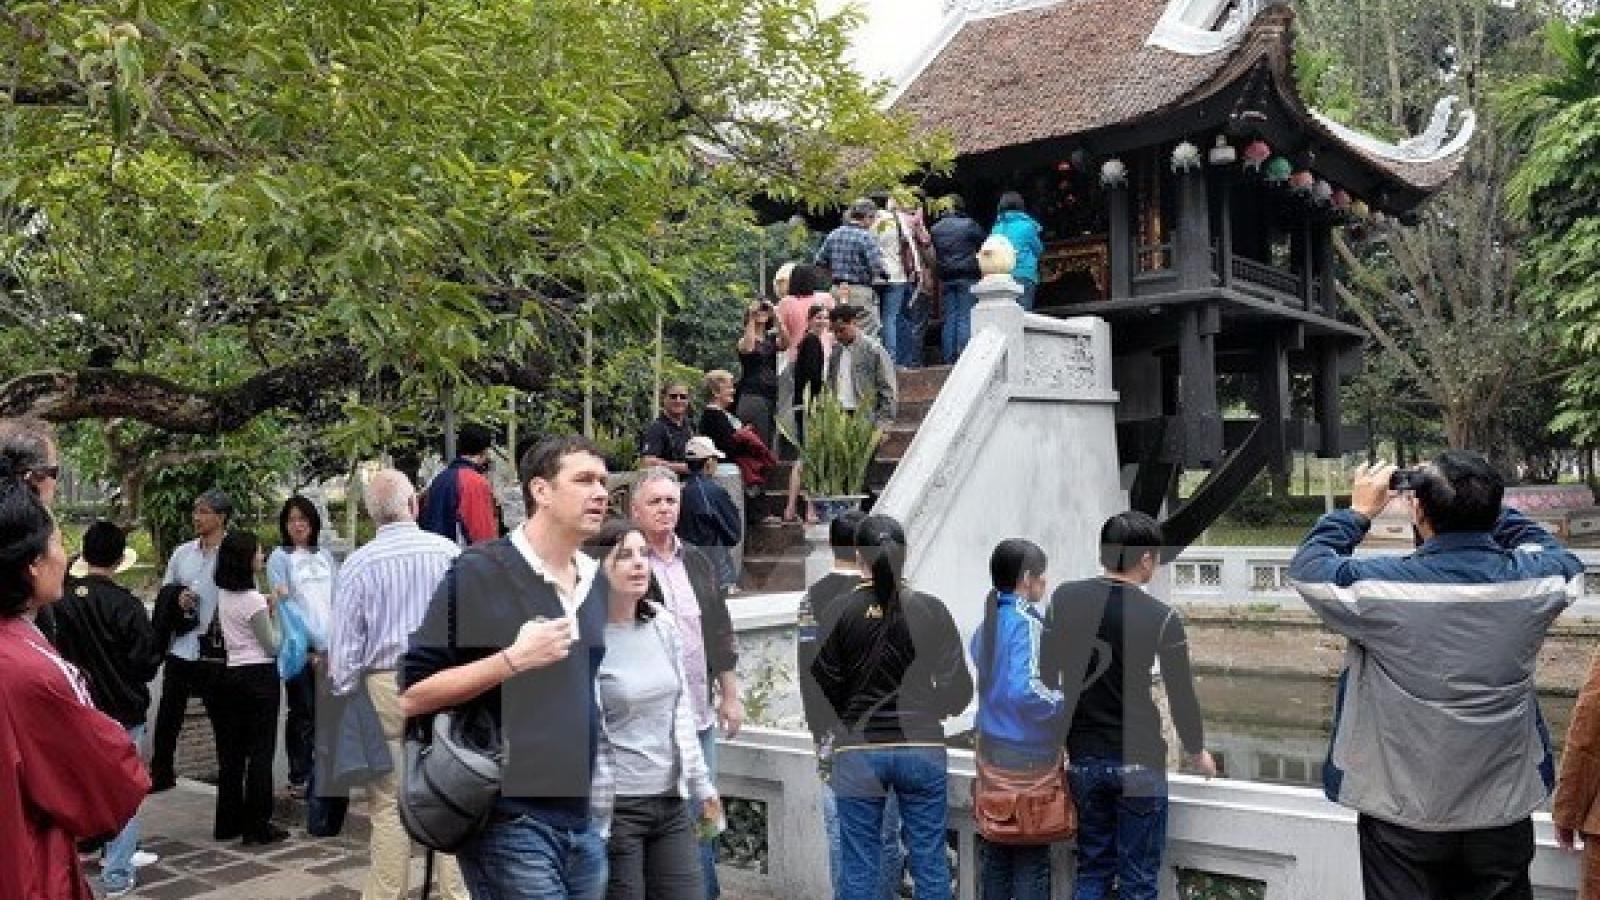 Vietnam promotes tourism through digital technology